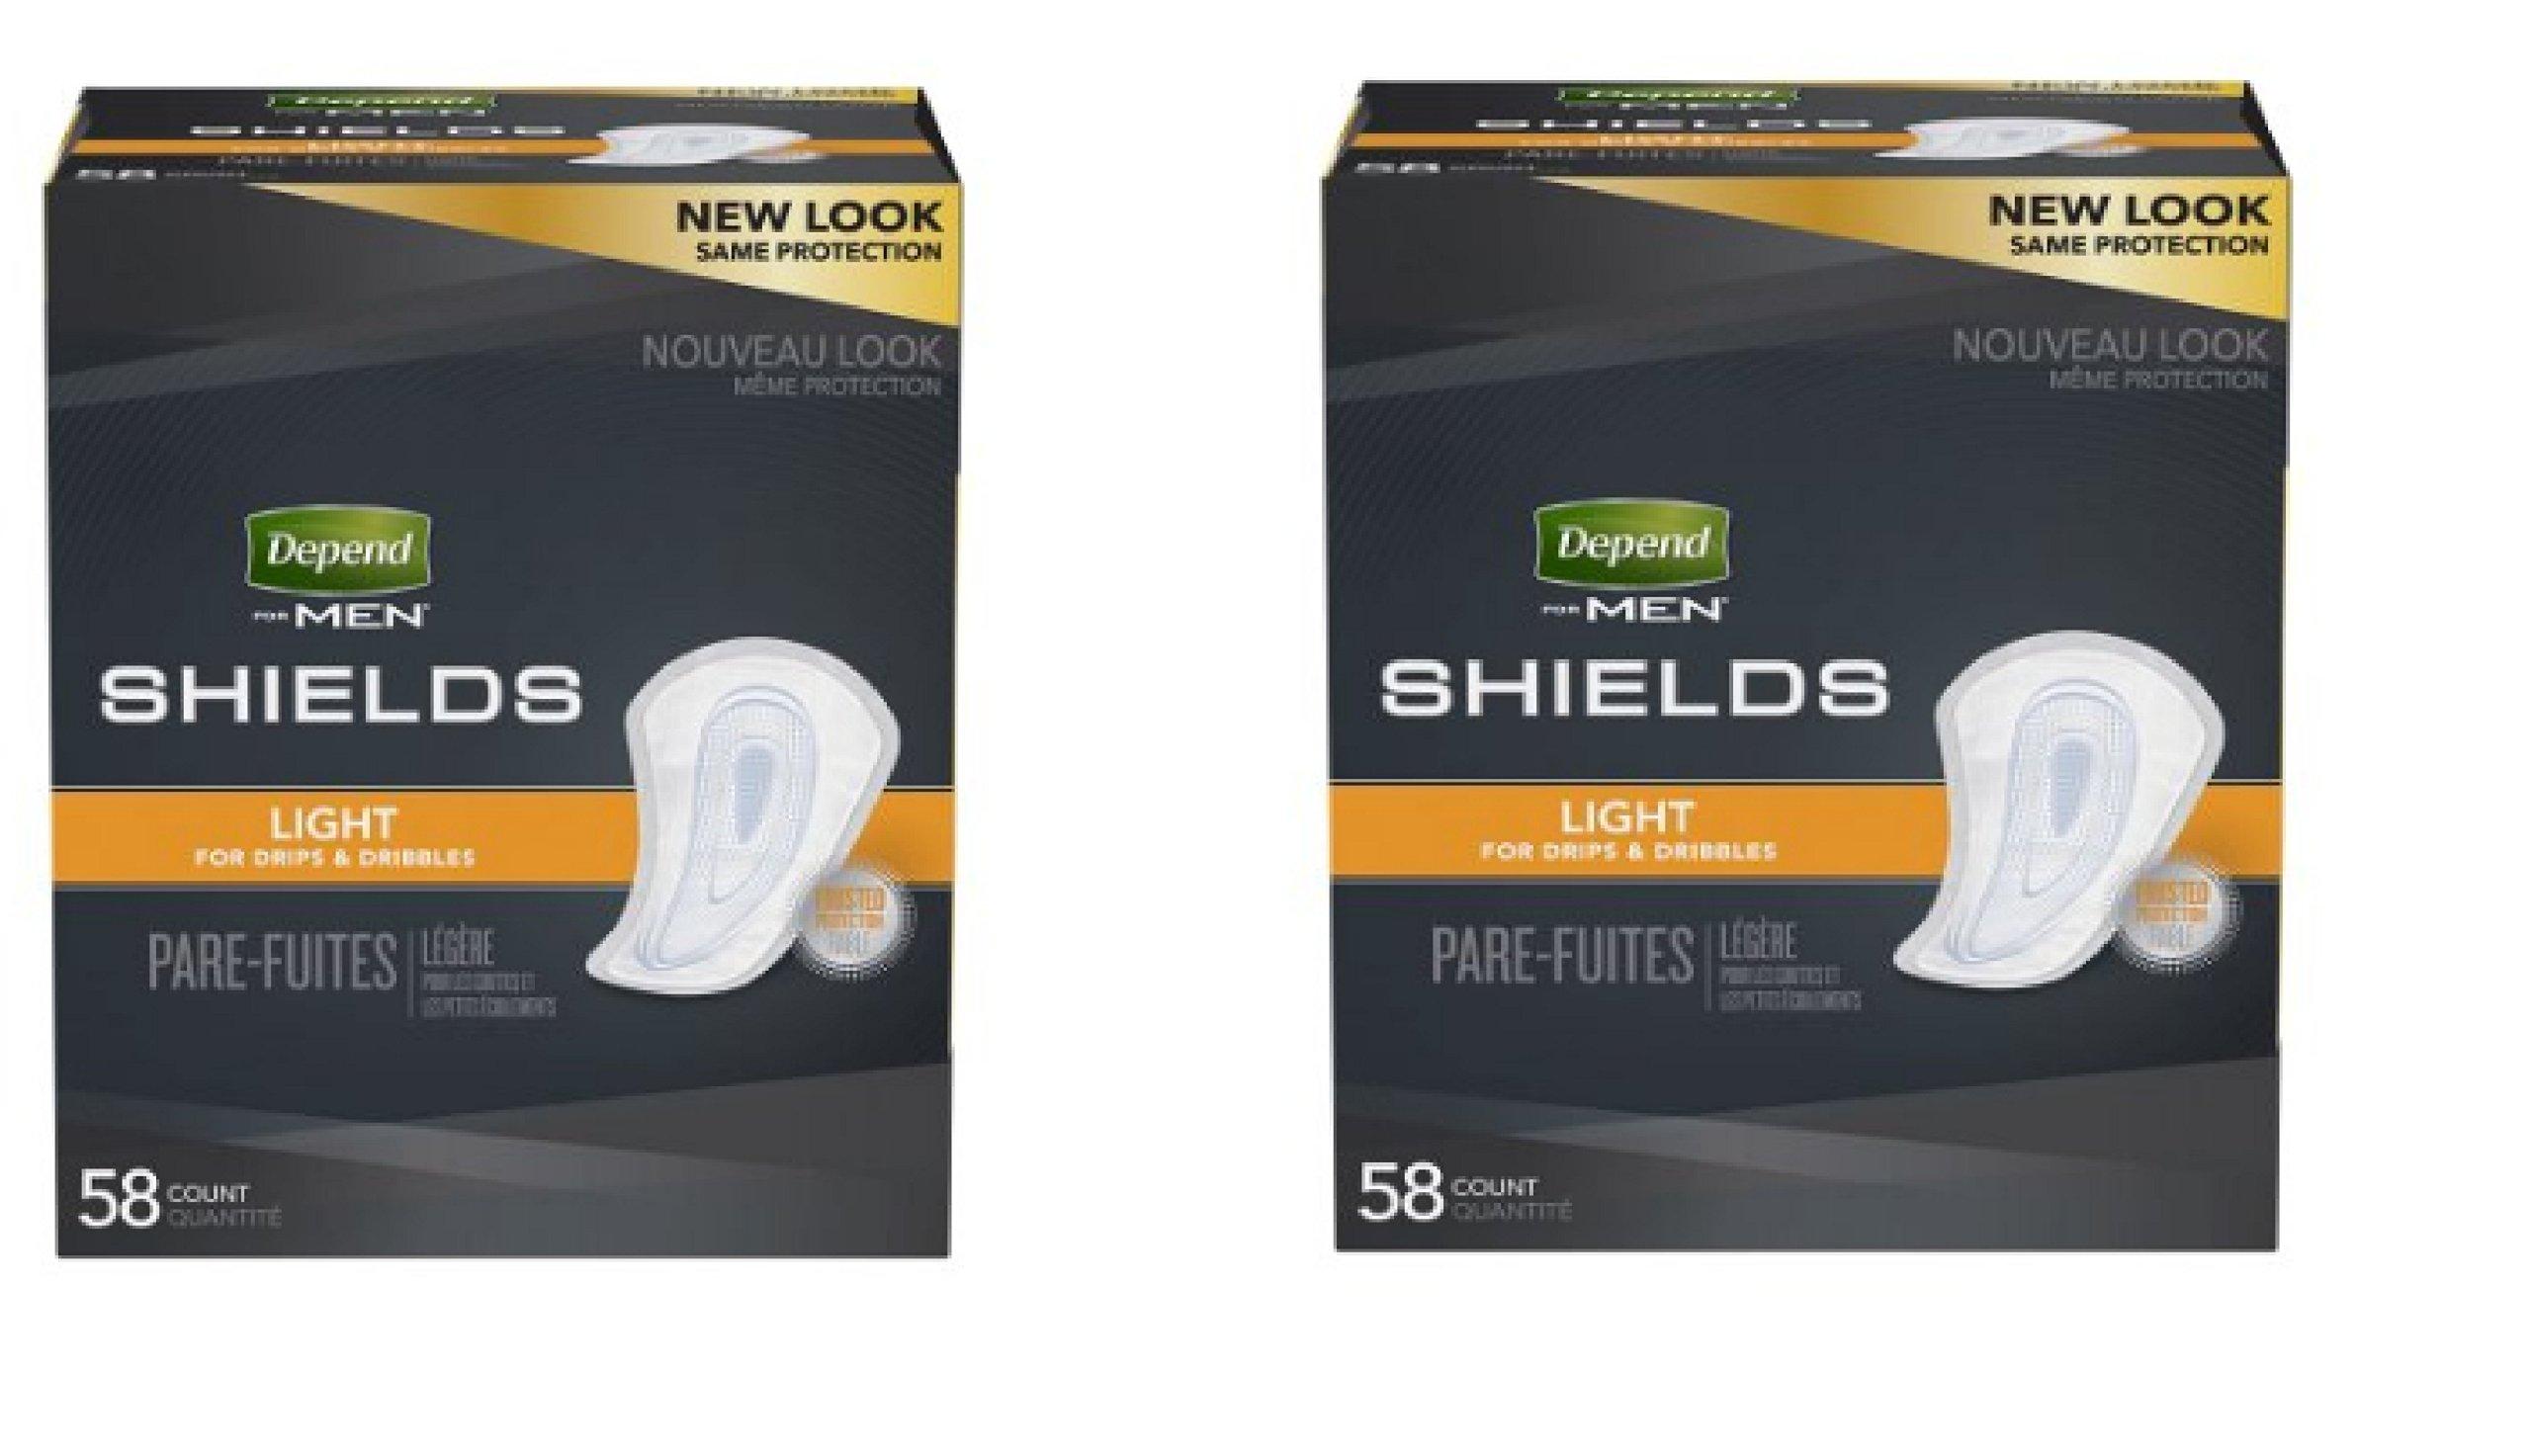 Depend for Men Shields Light Absorbency - 58 CT (2 pack)